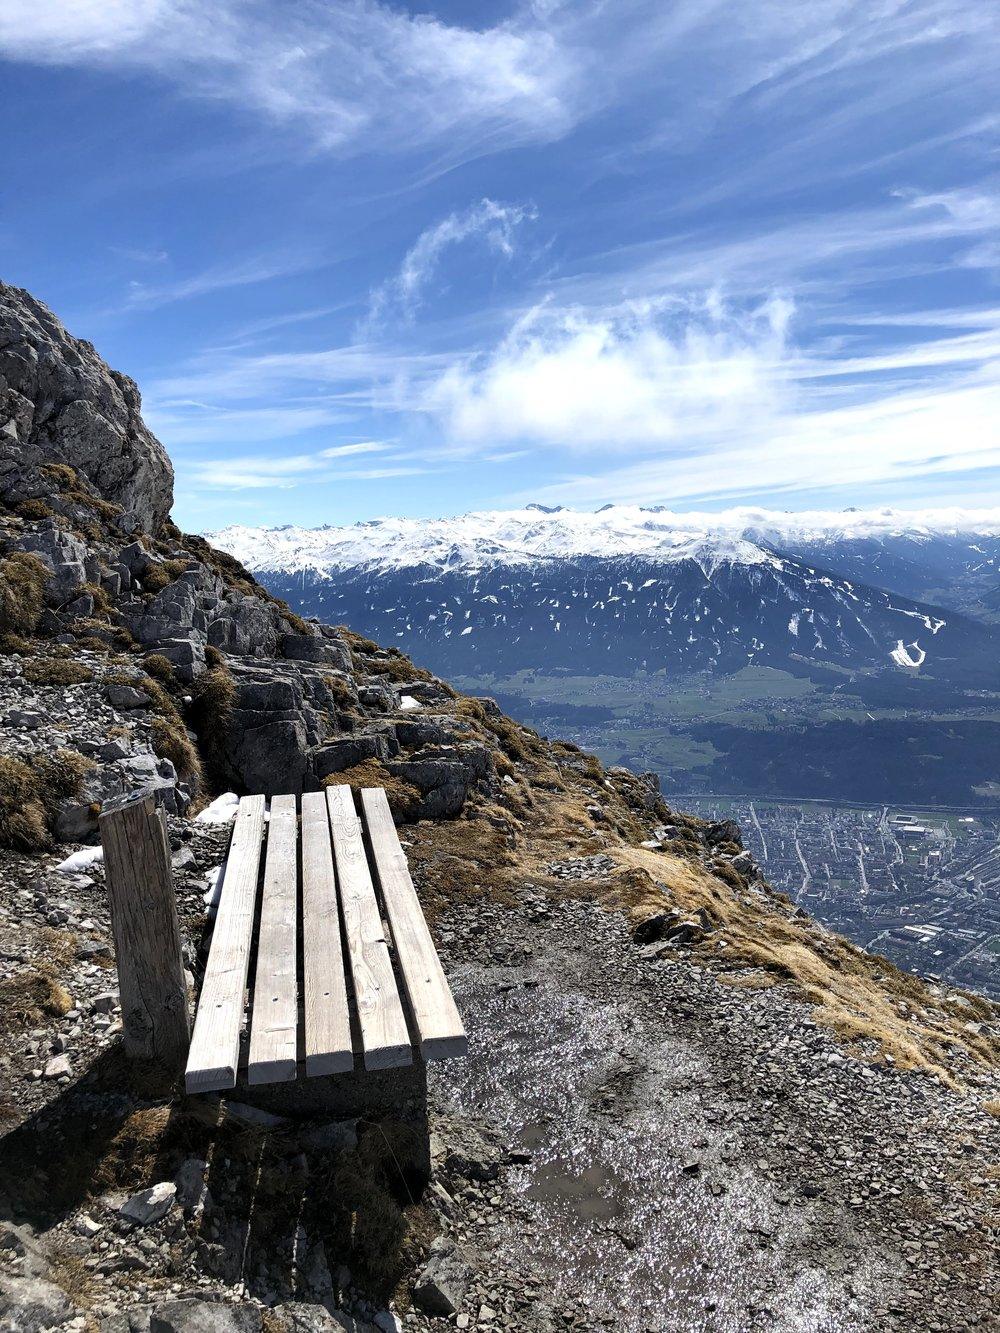 Hafelekar in the Nordkette mountains above Innsbruck